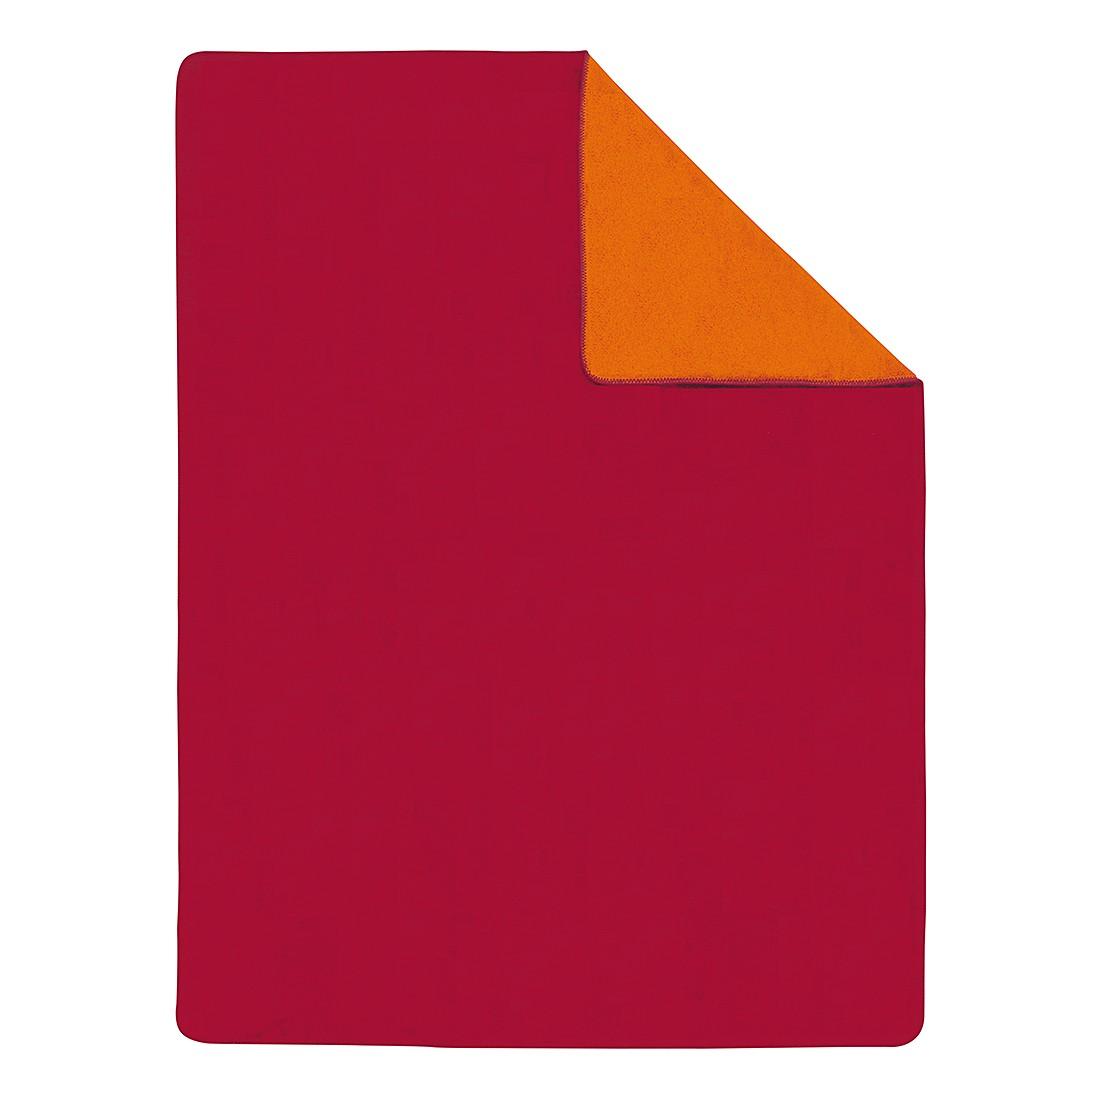 Uni Plaid Doubleface I – Rot / Orange, s.Oliver online bestellen